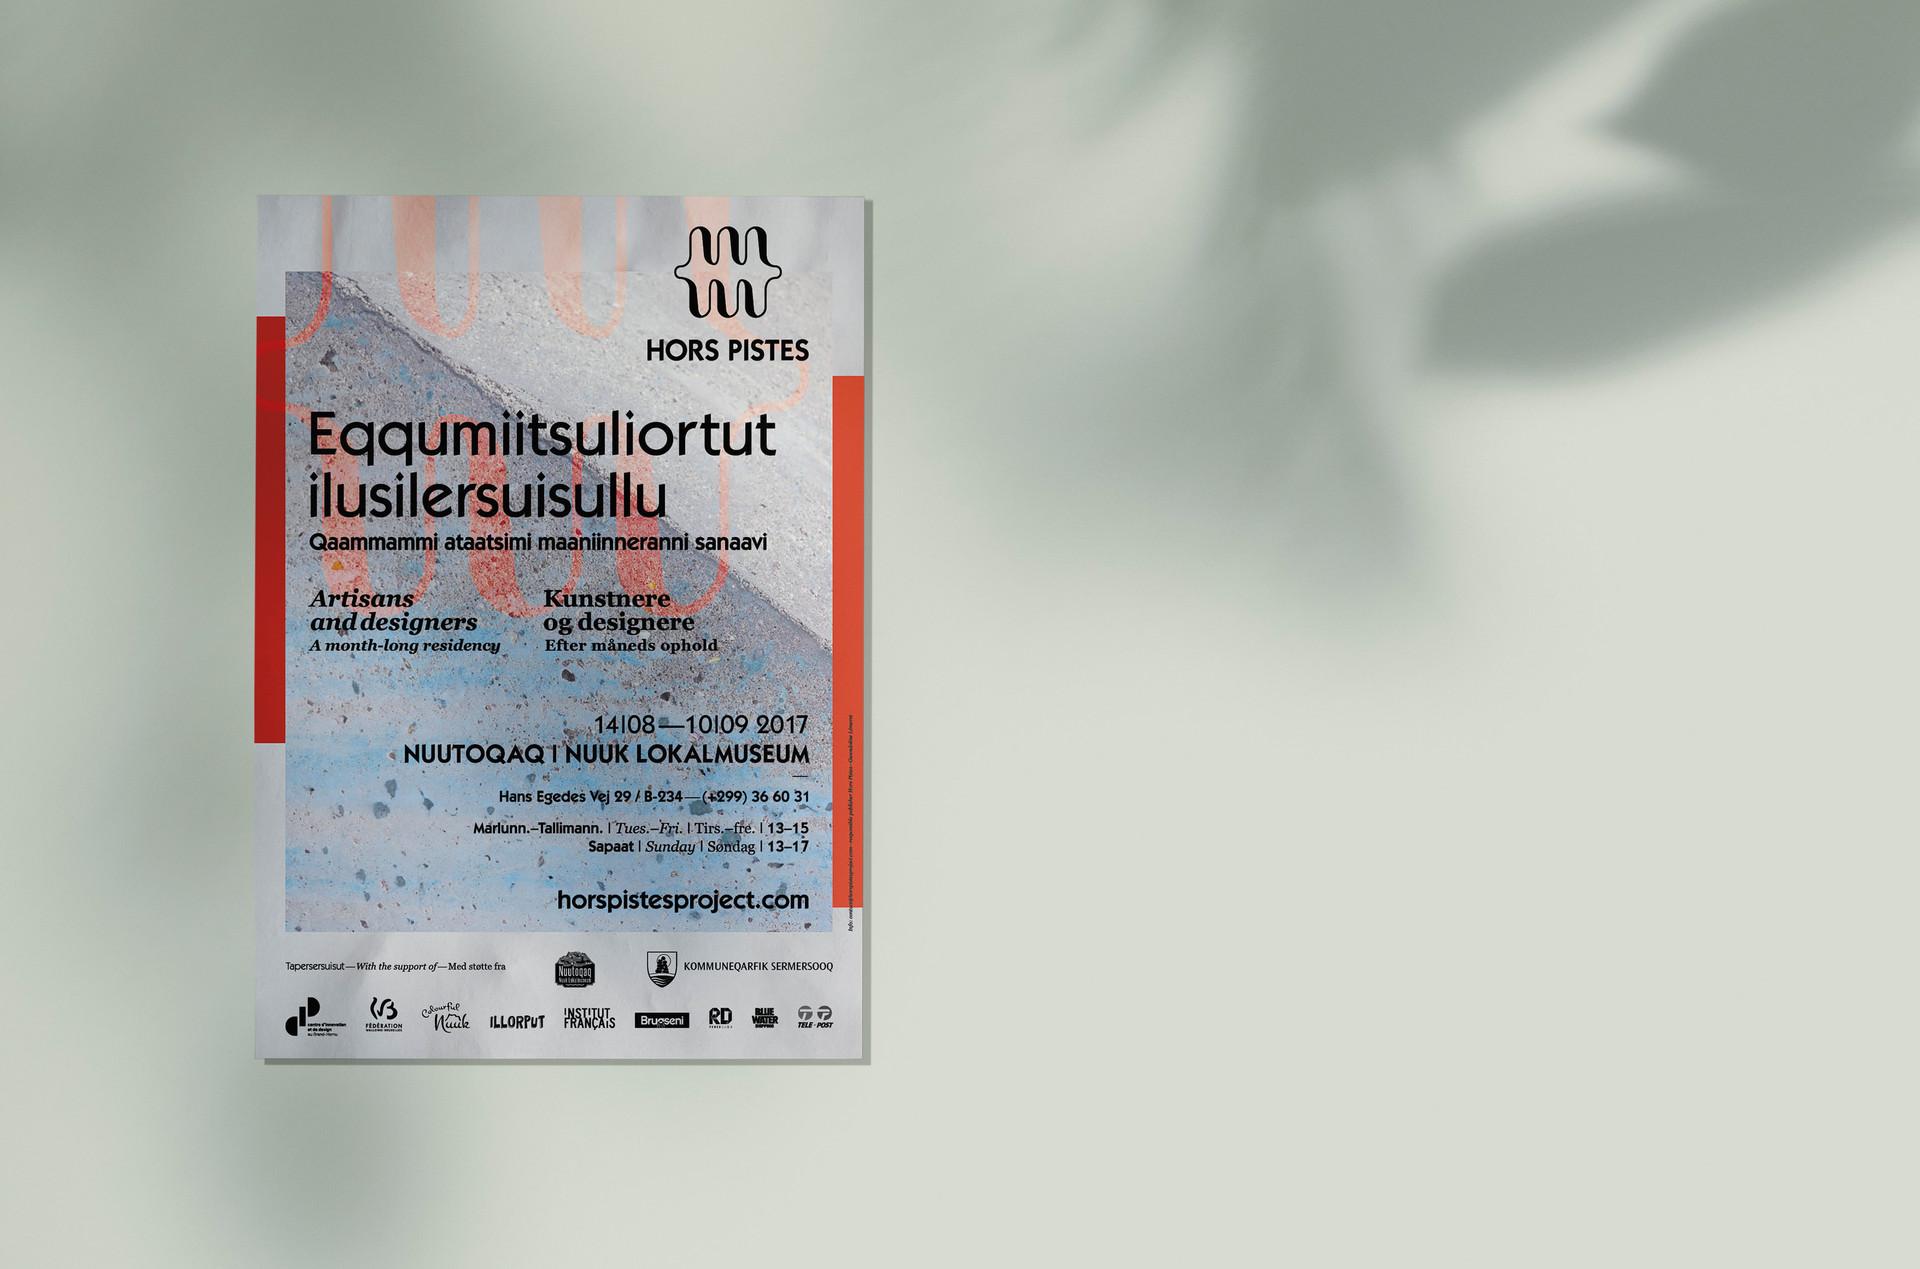 PosterLokalMuseum_HorsPistes_Nuuk2017 co